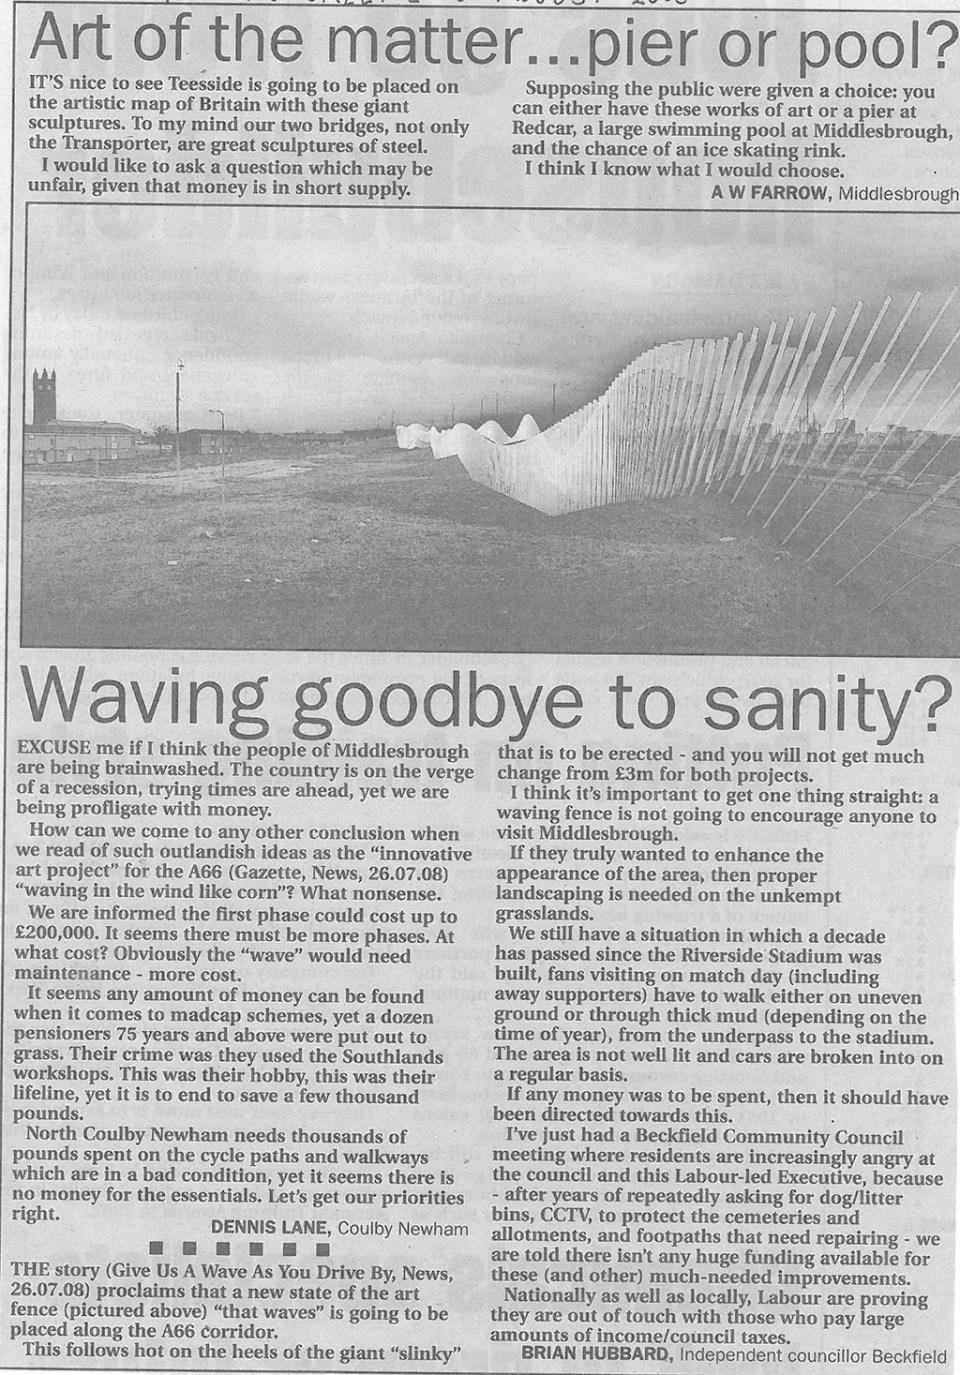 2008-08-06, Evening Gazette